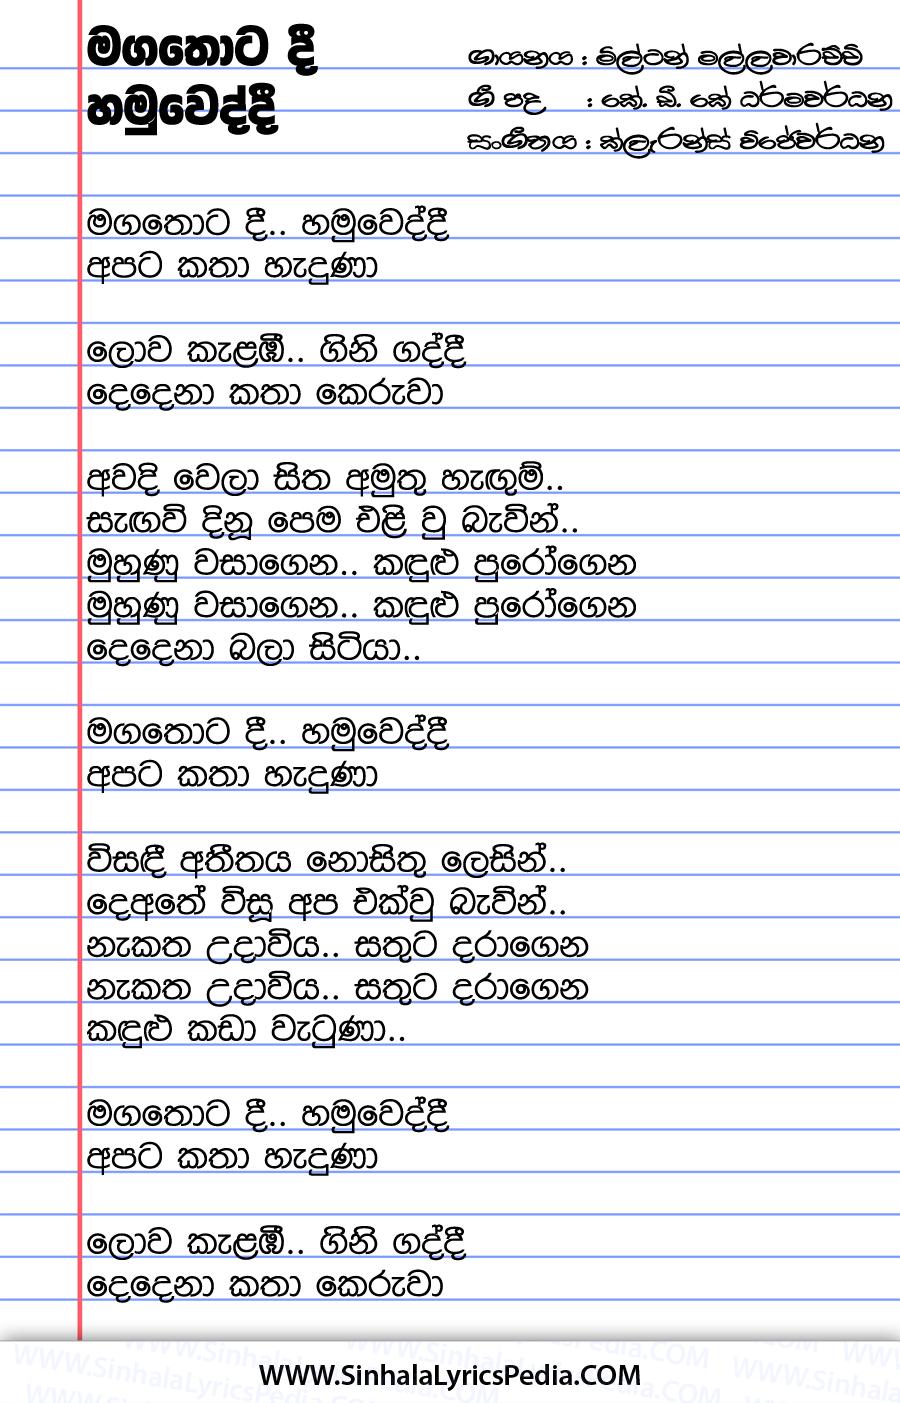 Maga Thotadi Hamuweddi Apata Katha Haduna Song Lyrics